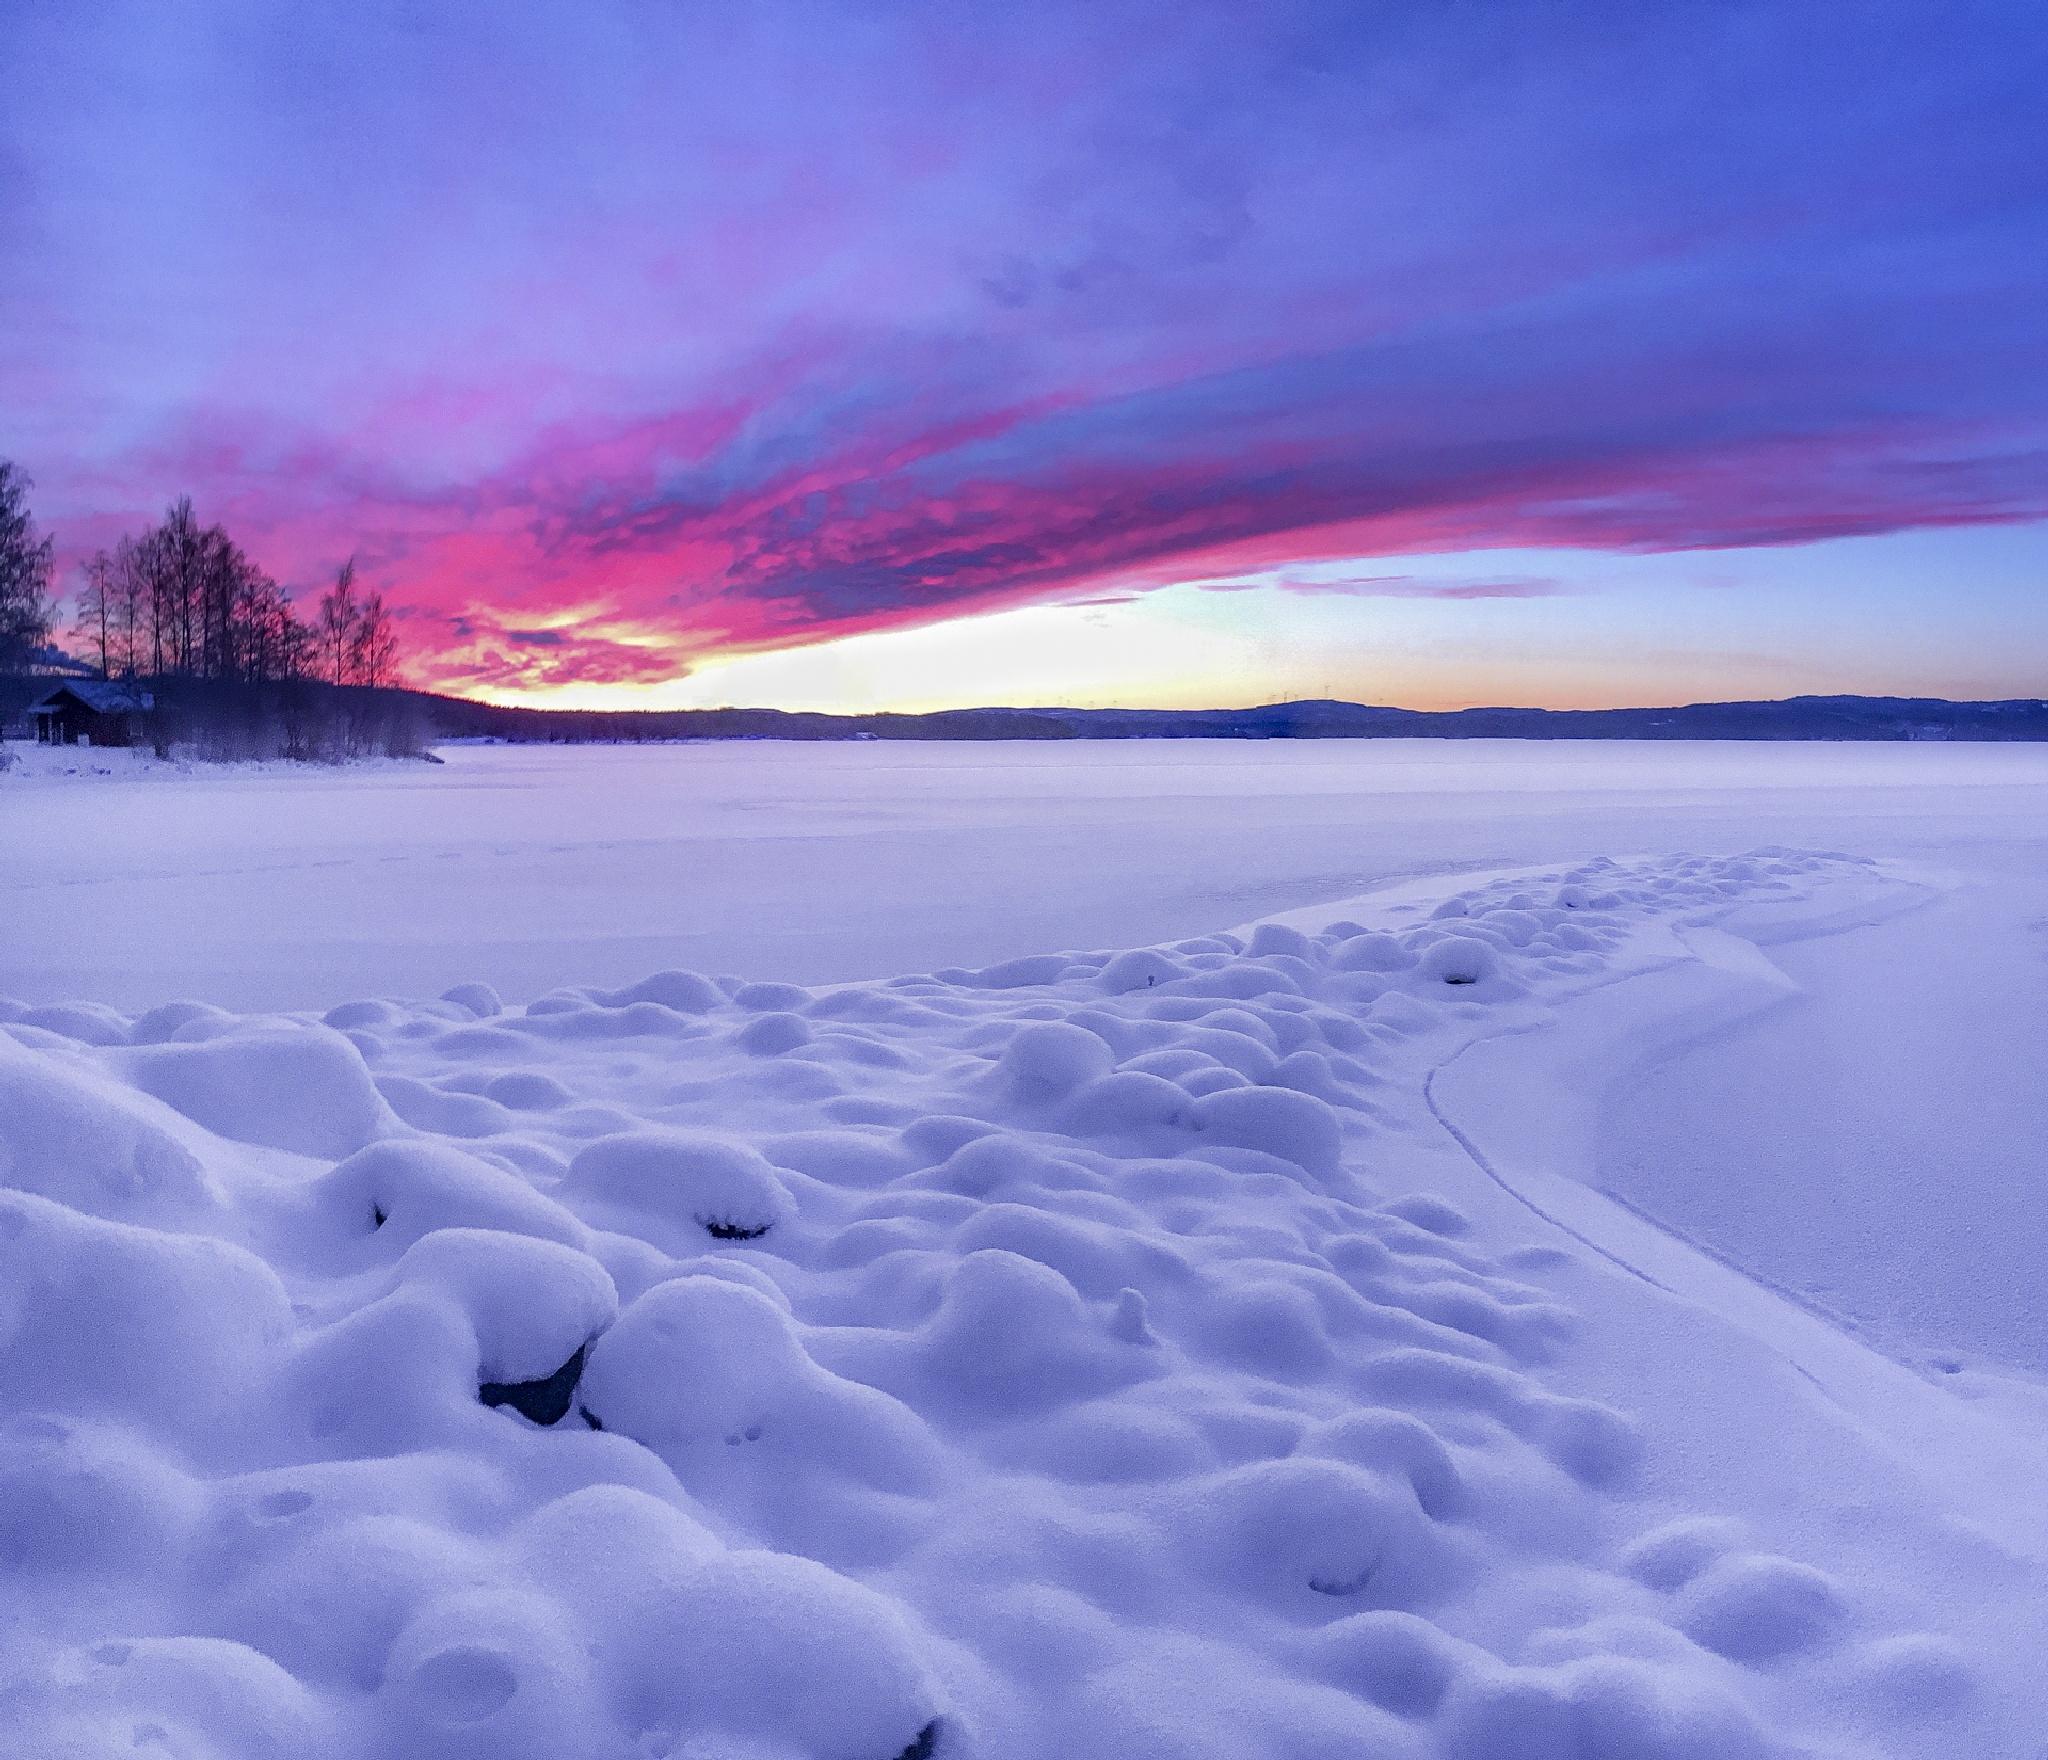 Snowey sunset by Marcus Holmqvist